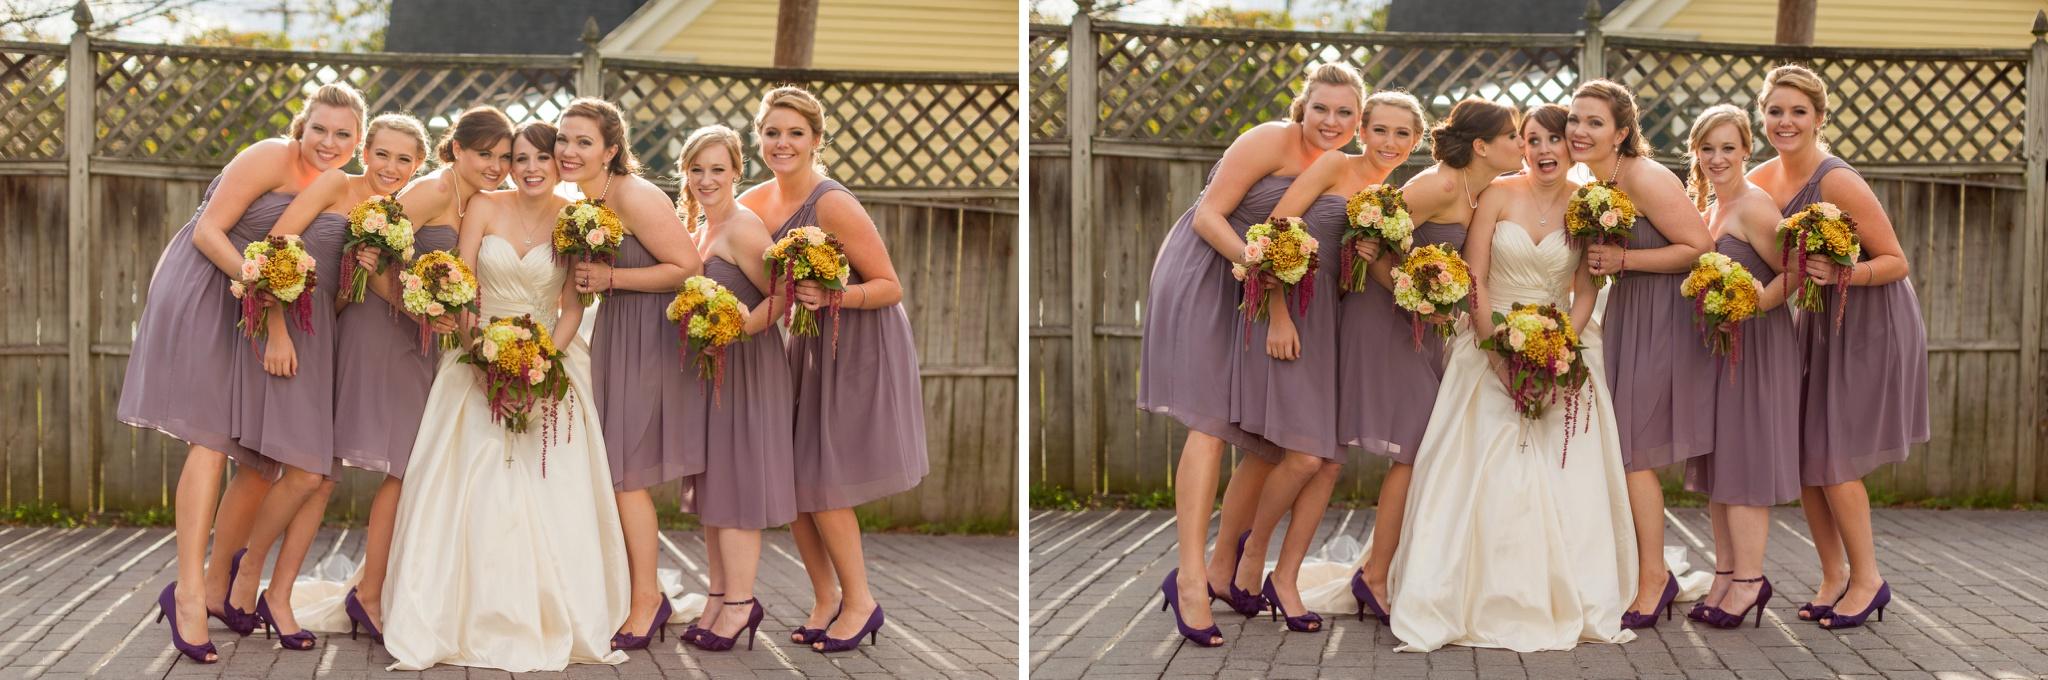 fun-wedding-photographer-nashville-tn